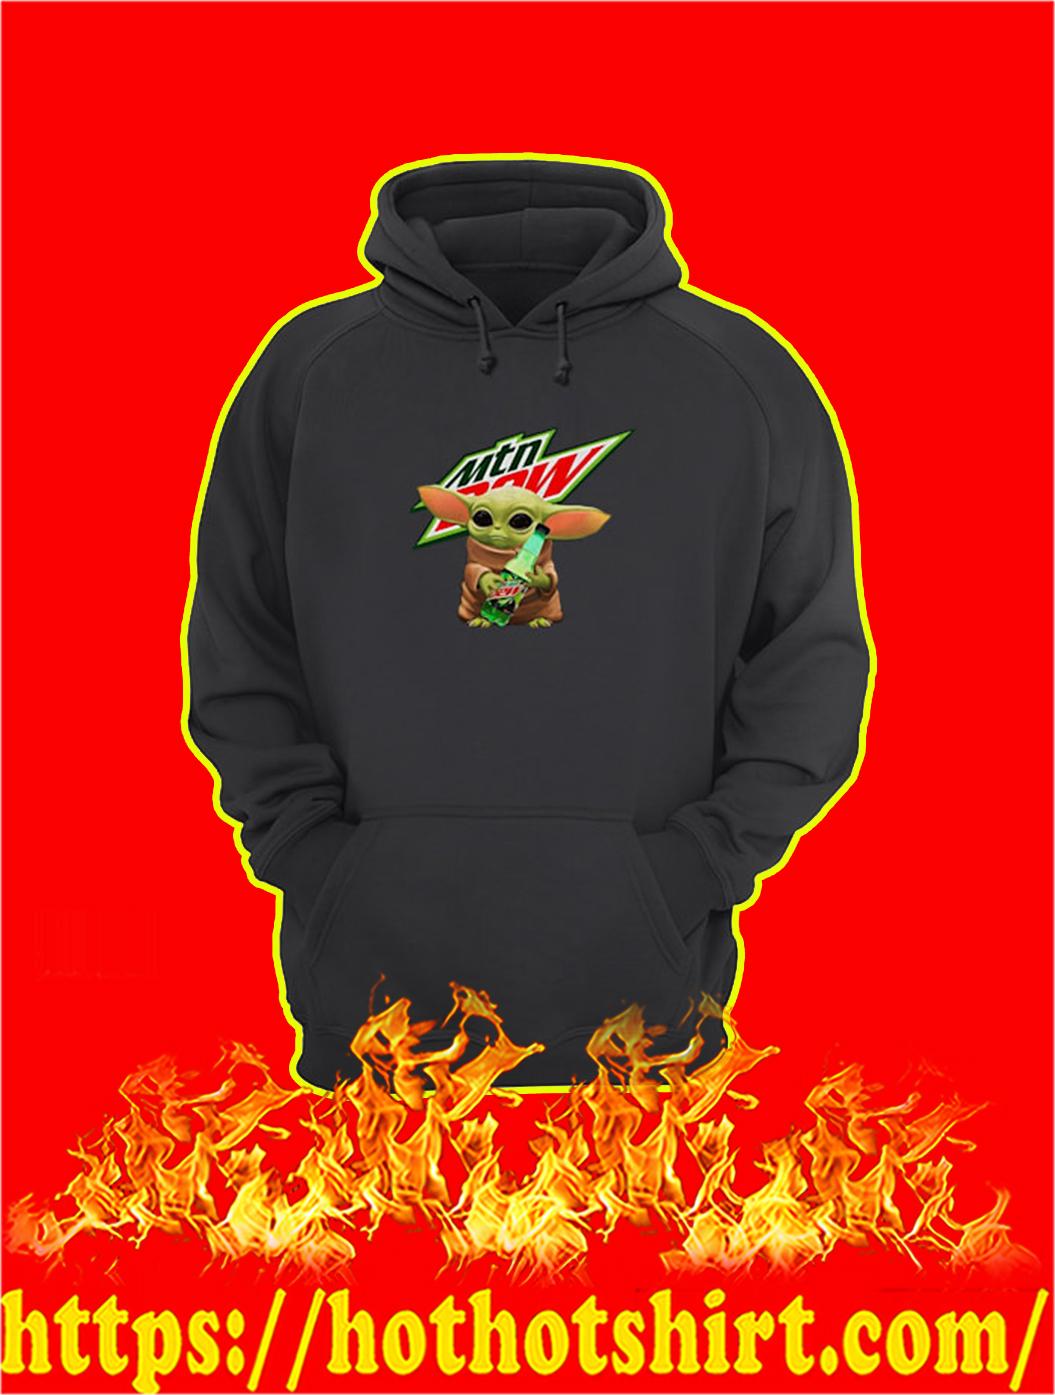 Baby Yoda Hug Mountain Dew hoodie